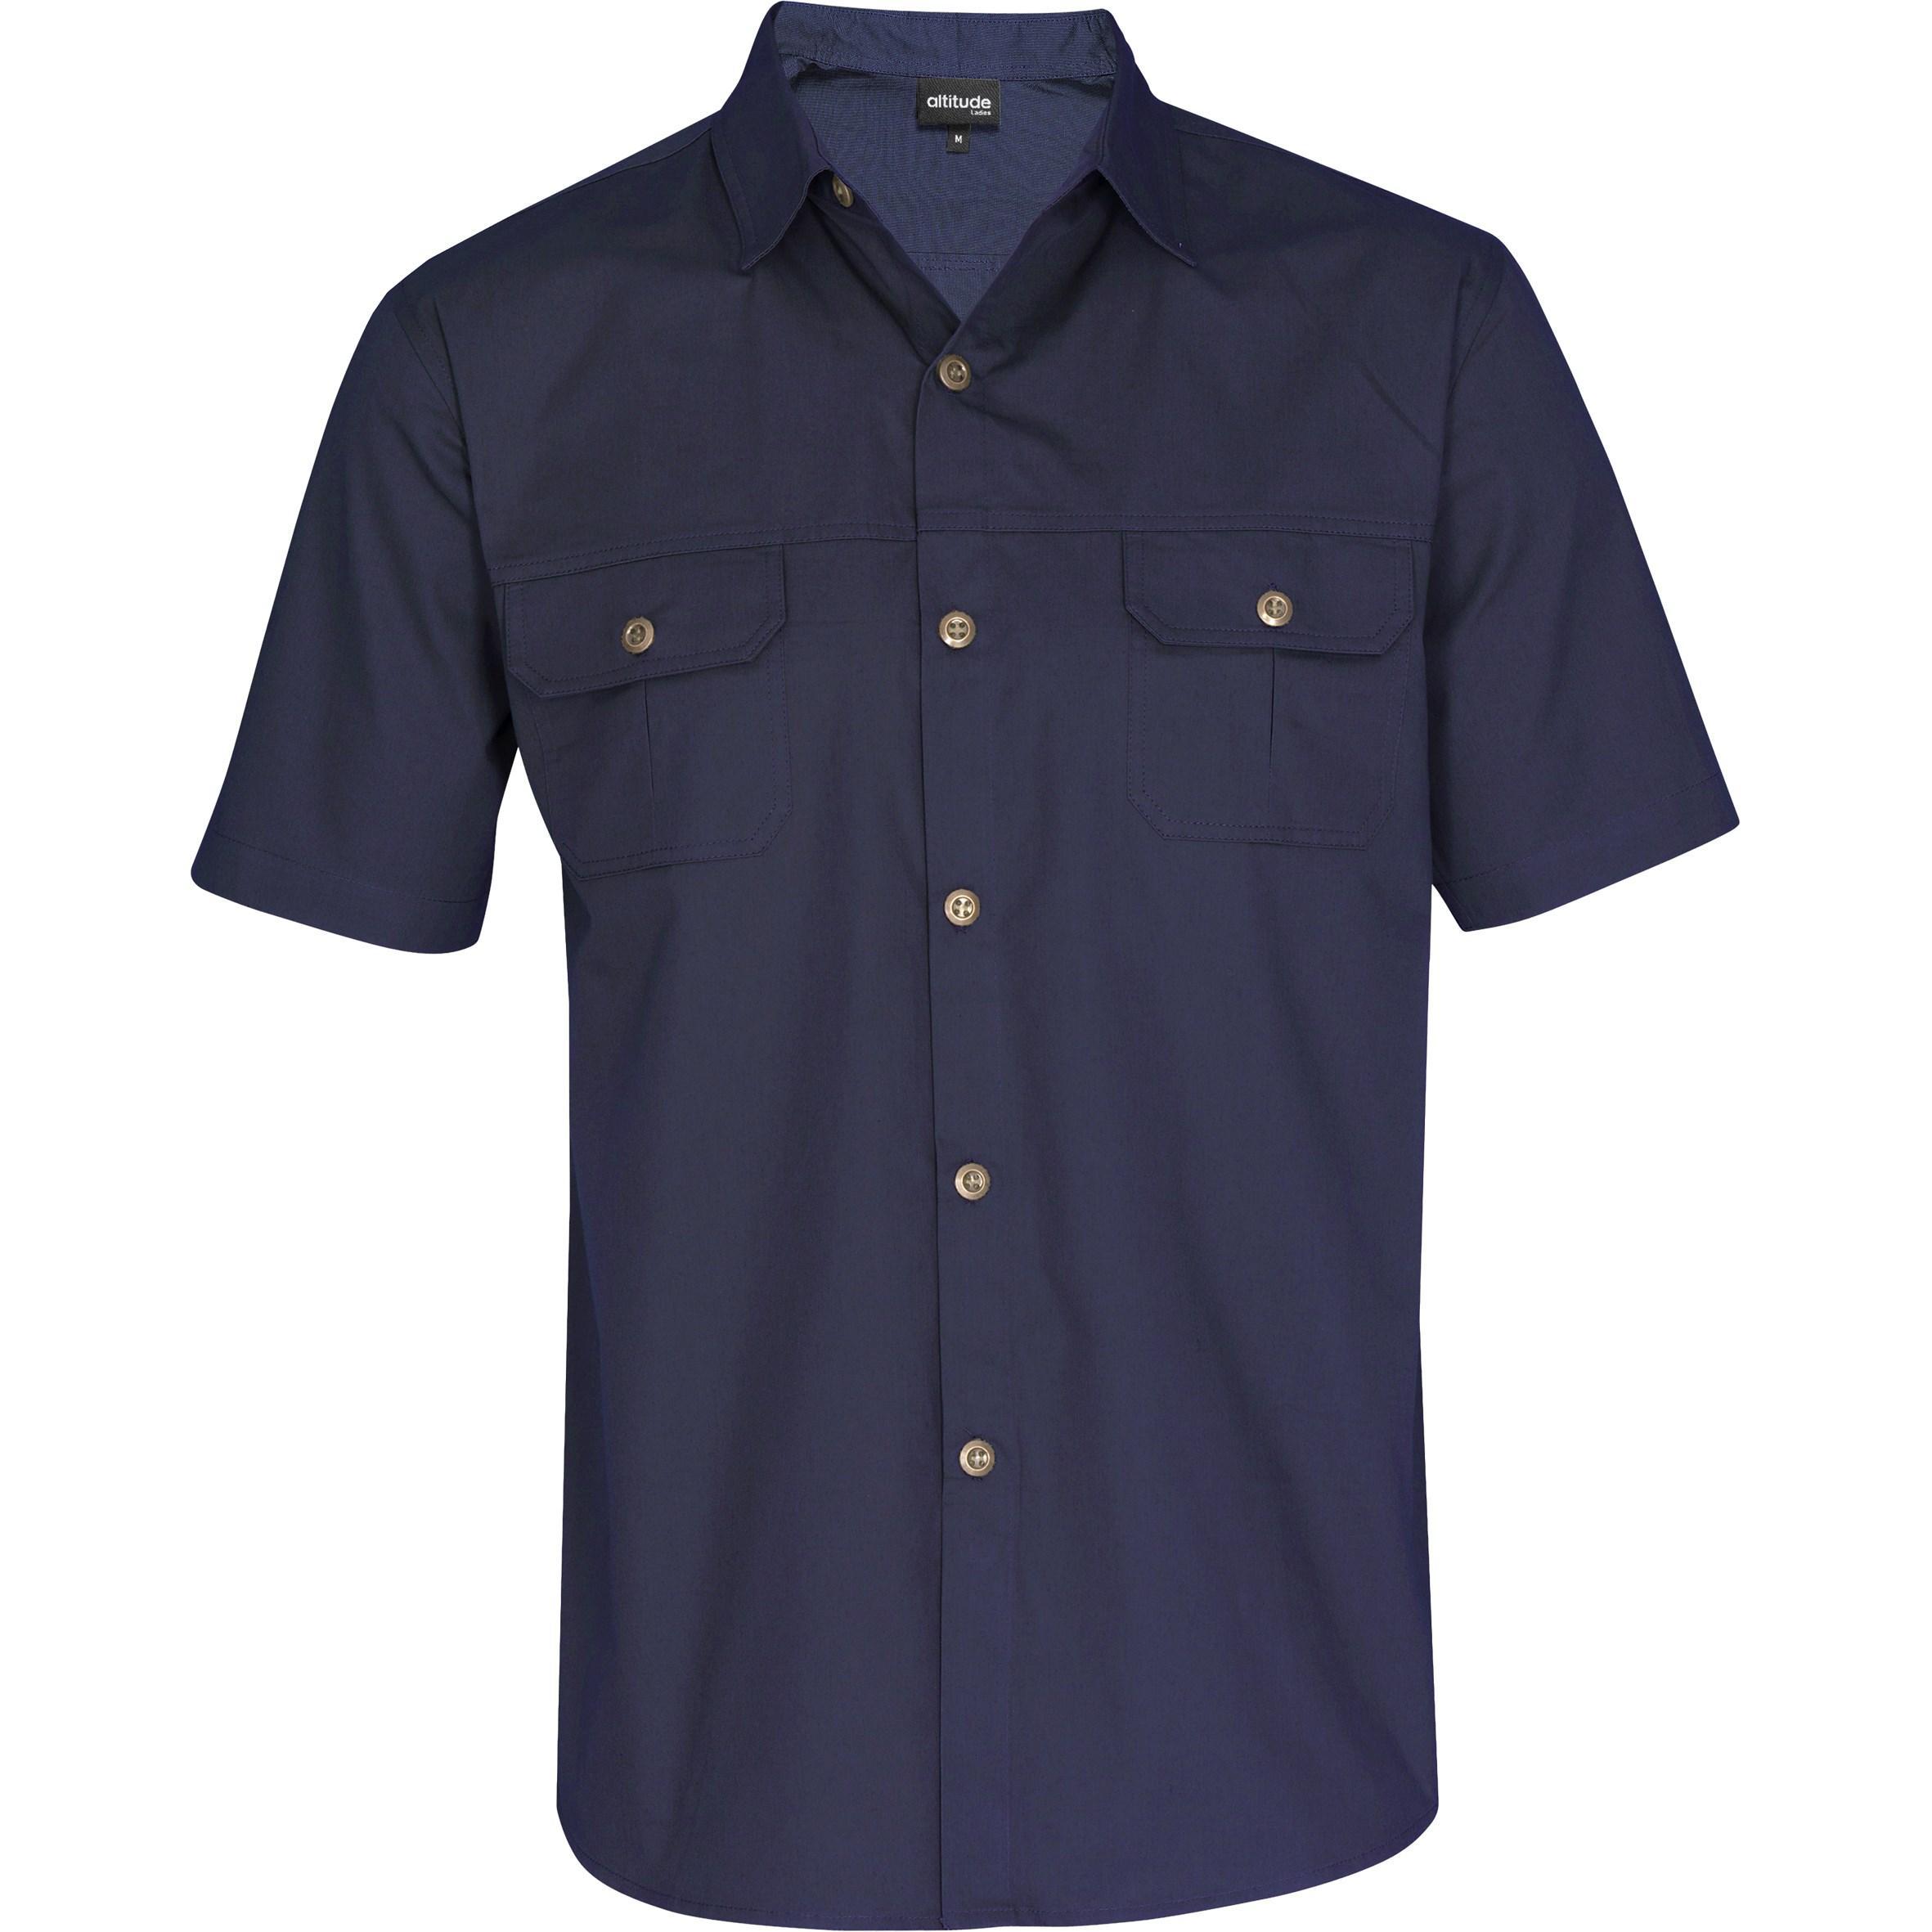 Mens Short Sleeve Oryx Bush Shirt - Navy Only